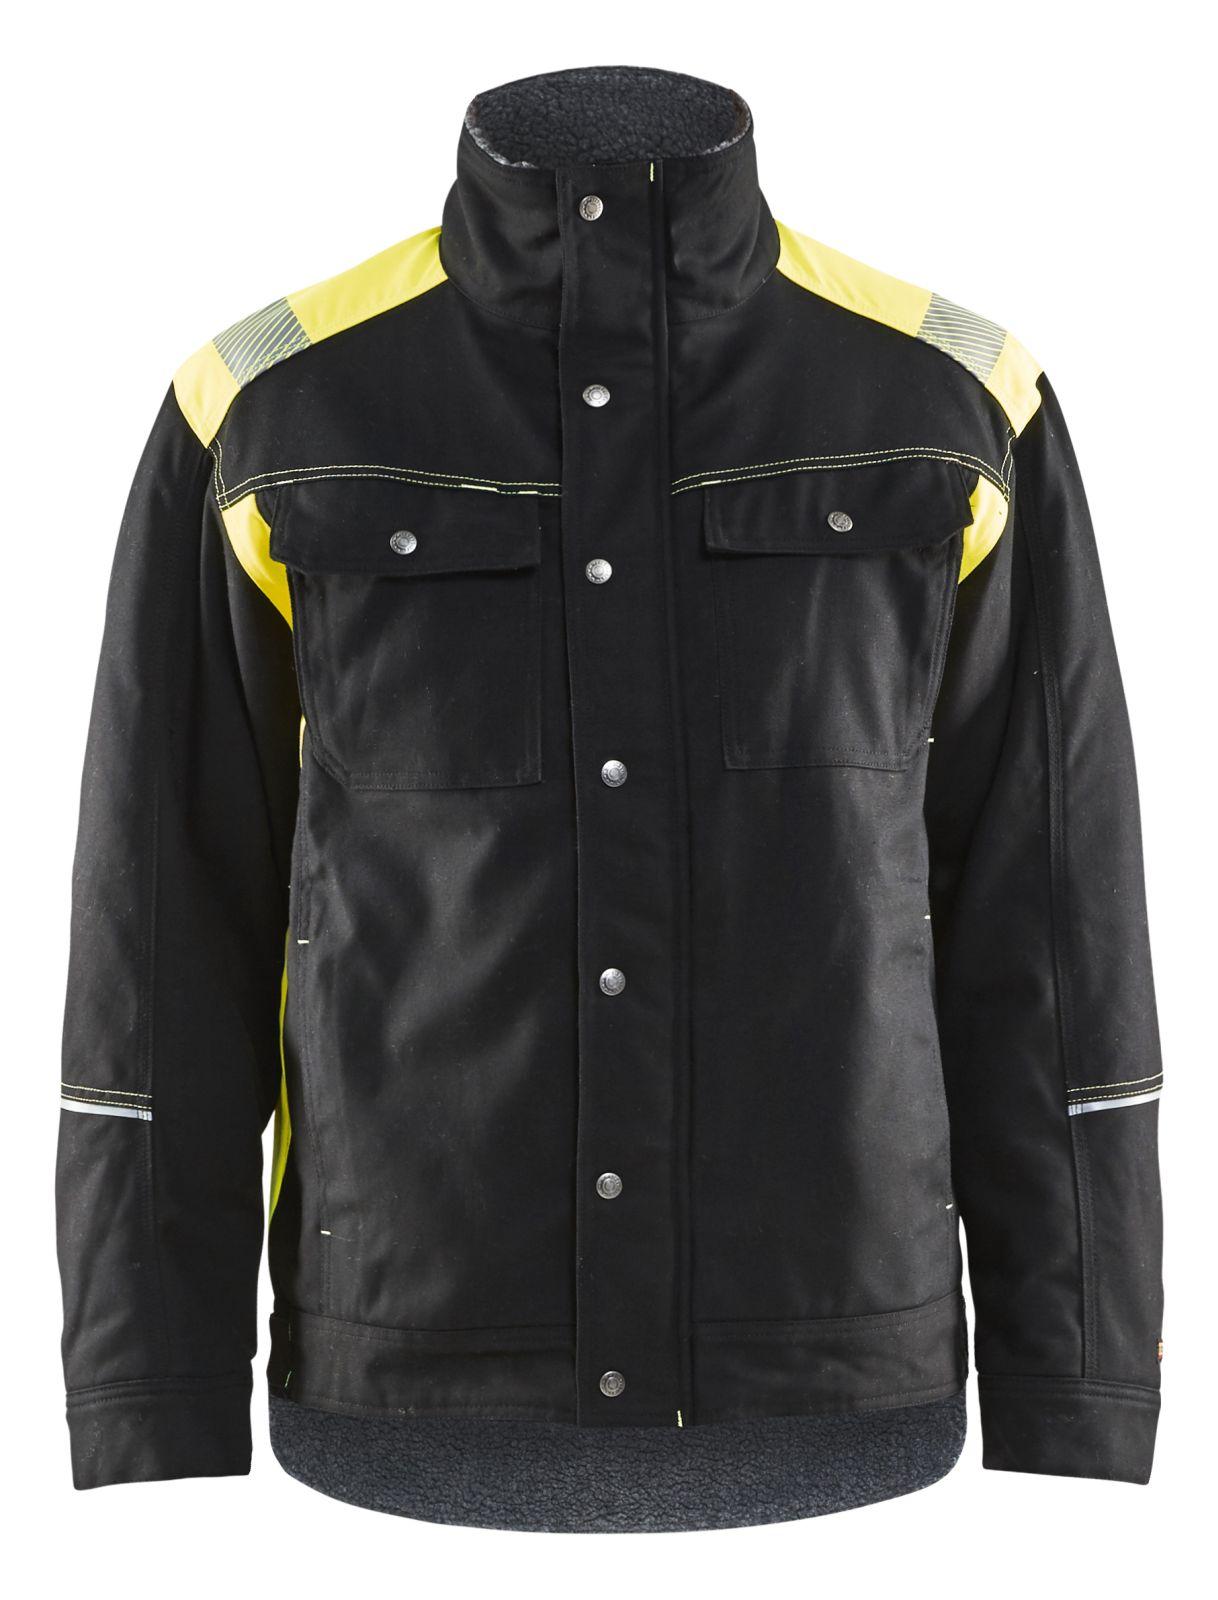 Blaklader Winterjacks 49151370 zwart-geel(9933)